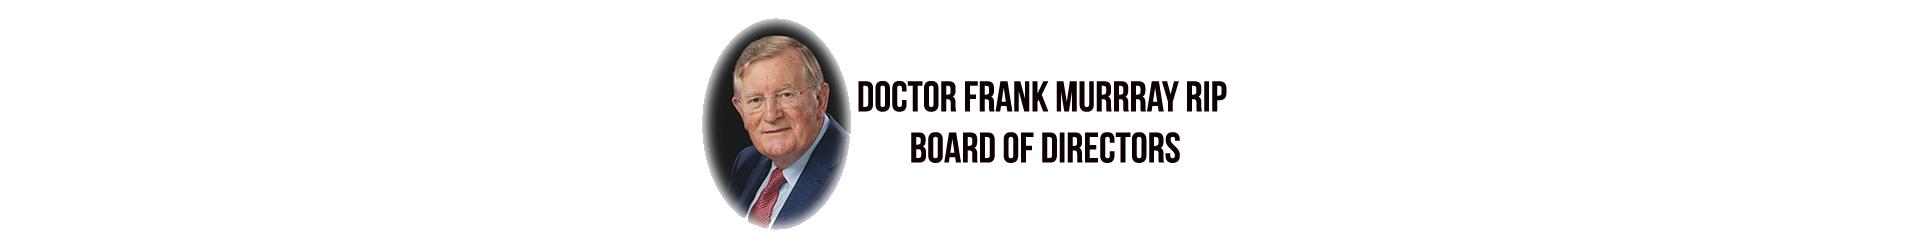 Doctor Frank Murrray RIP – Board of Directors